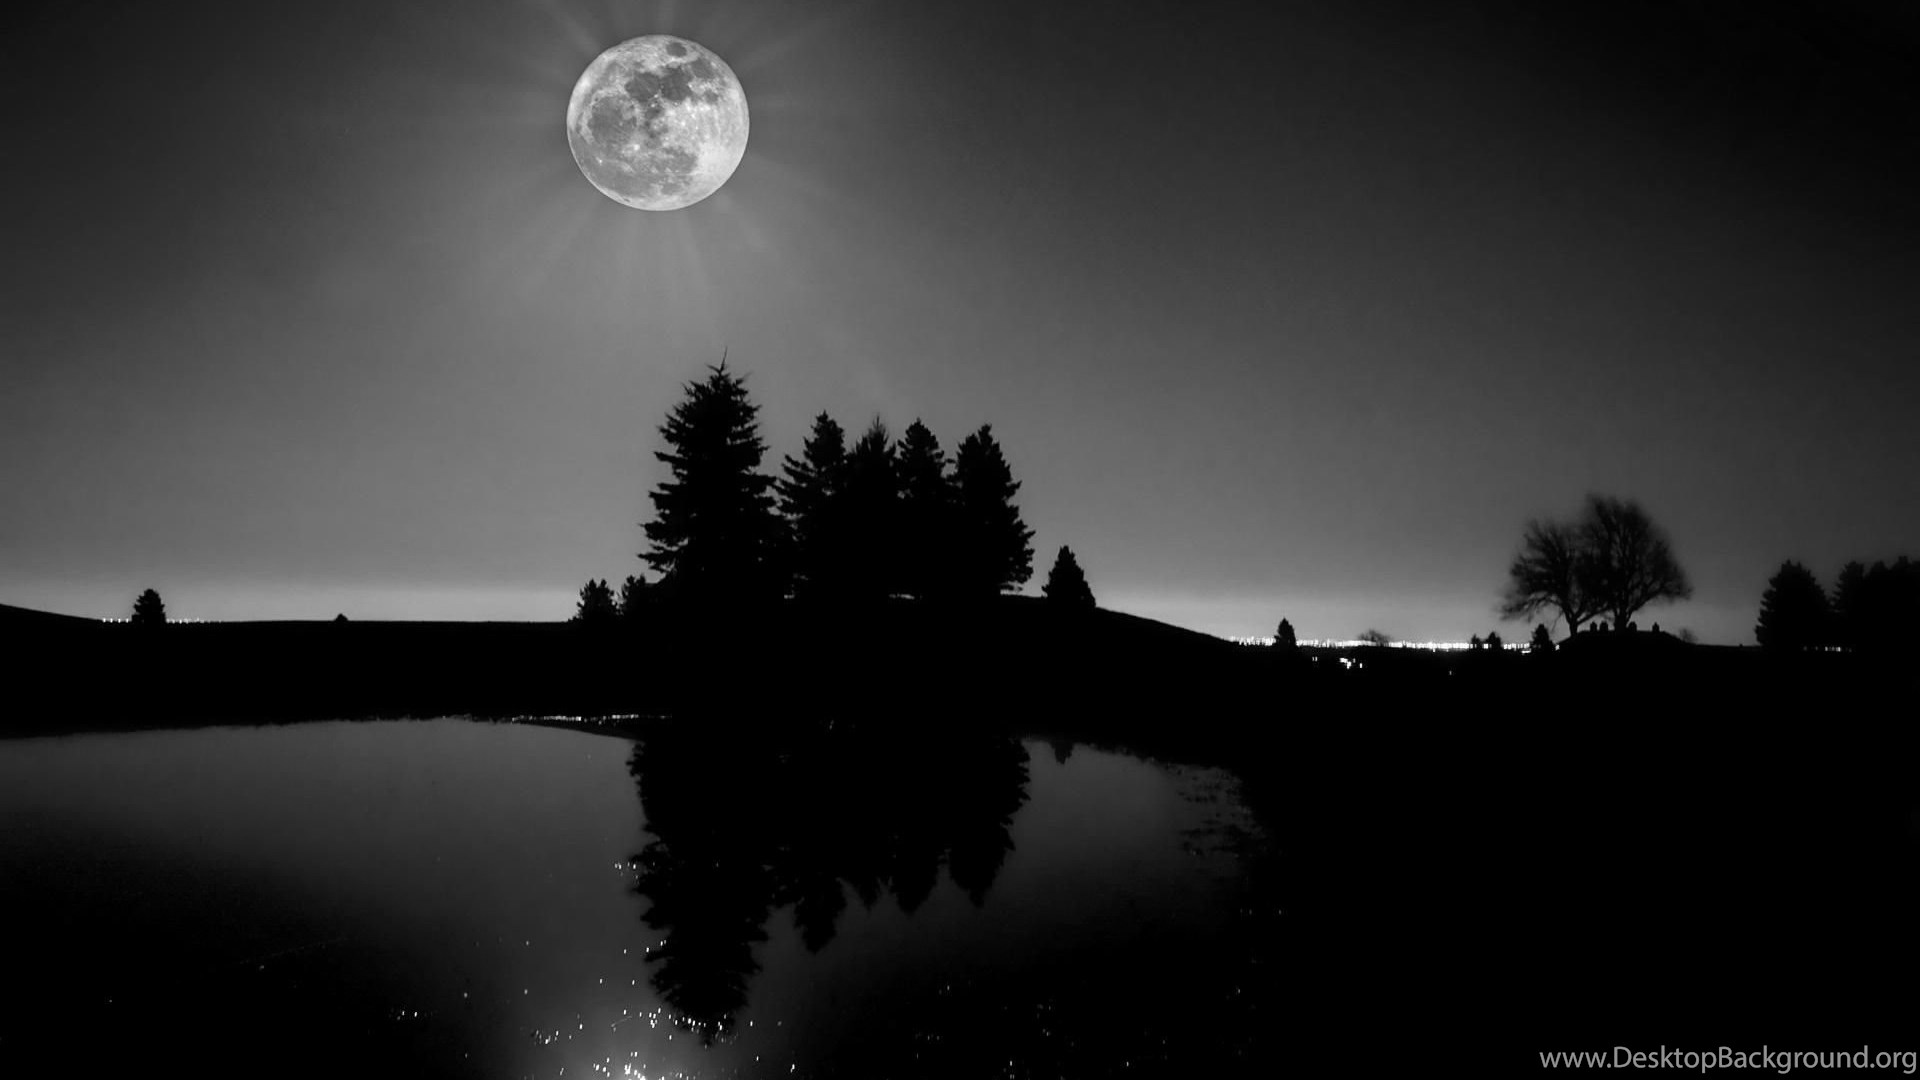 Nature Landscape Black And White Moon Light Wallpaper Black And Desktop Background